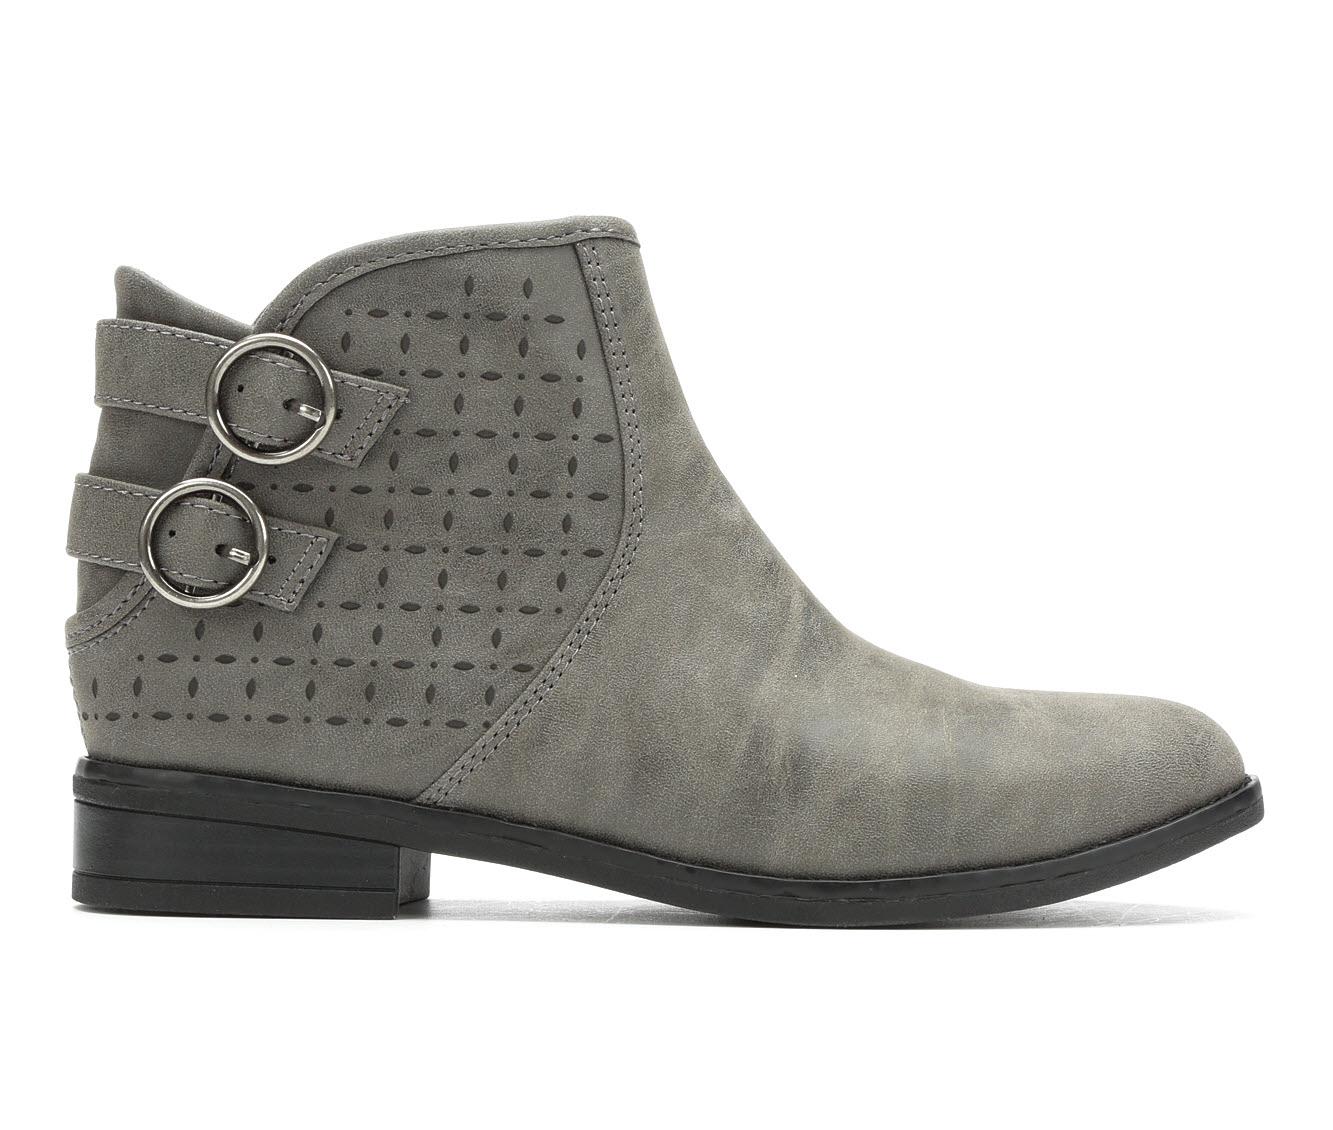 Rocket Dog Marko Women's Boot (Gray Faux Leather)